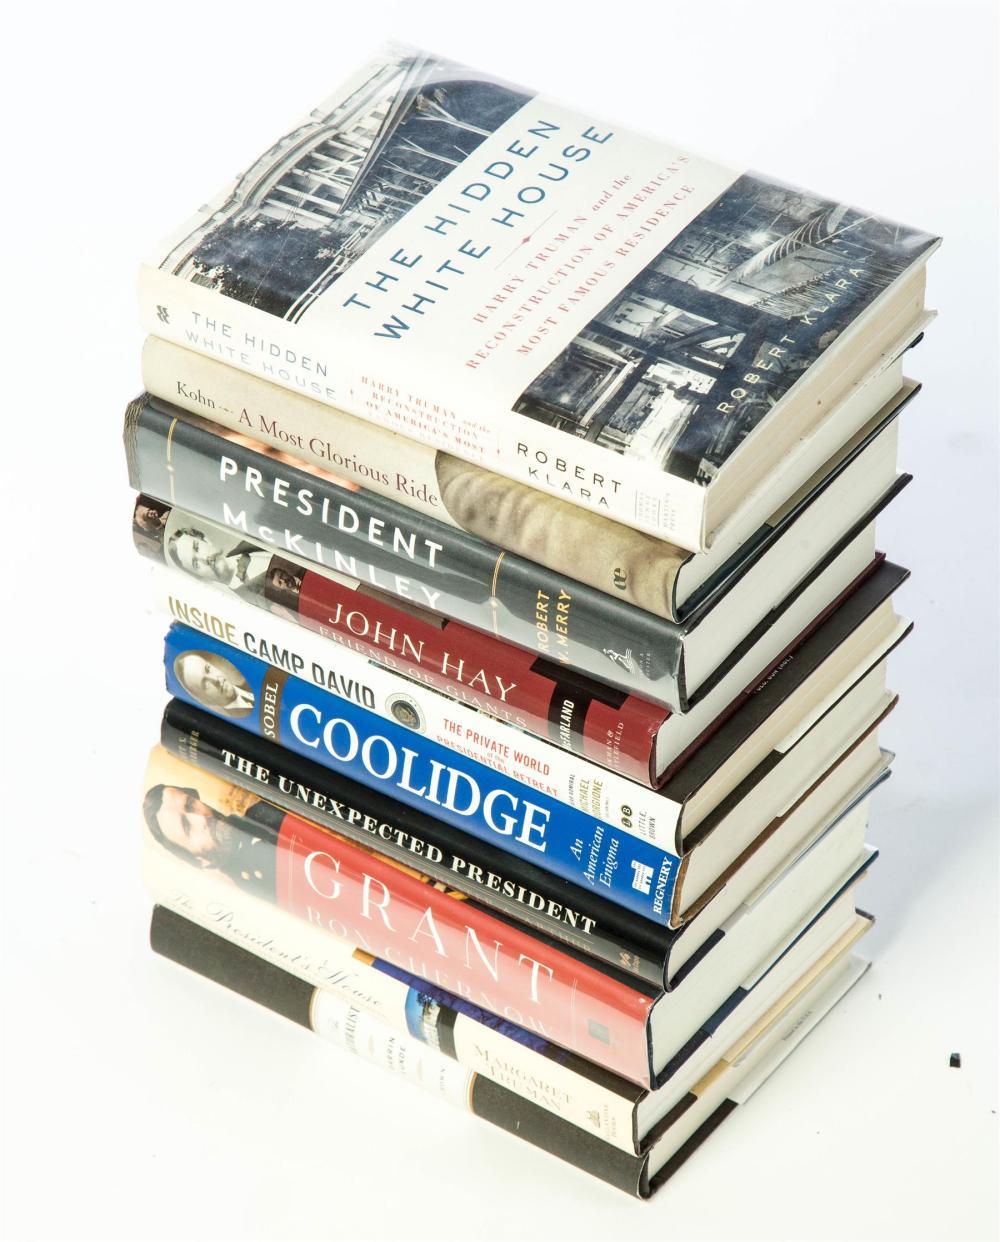 GROUP OF 10 PRESIDENT BOOKS.